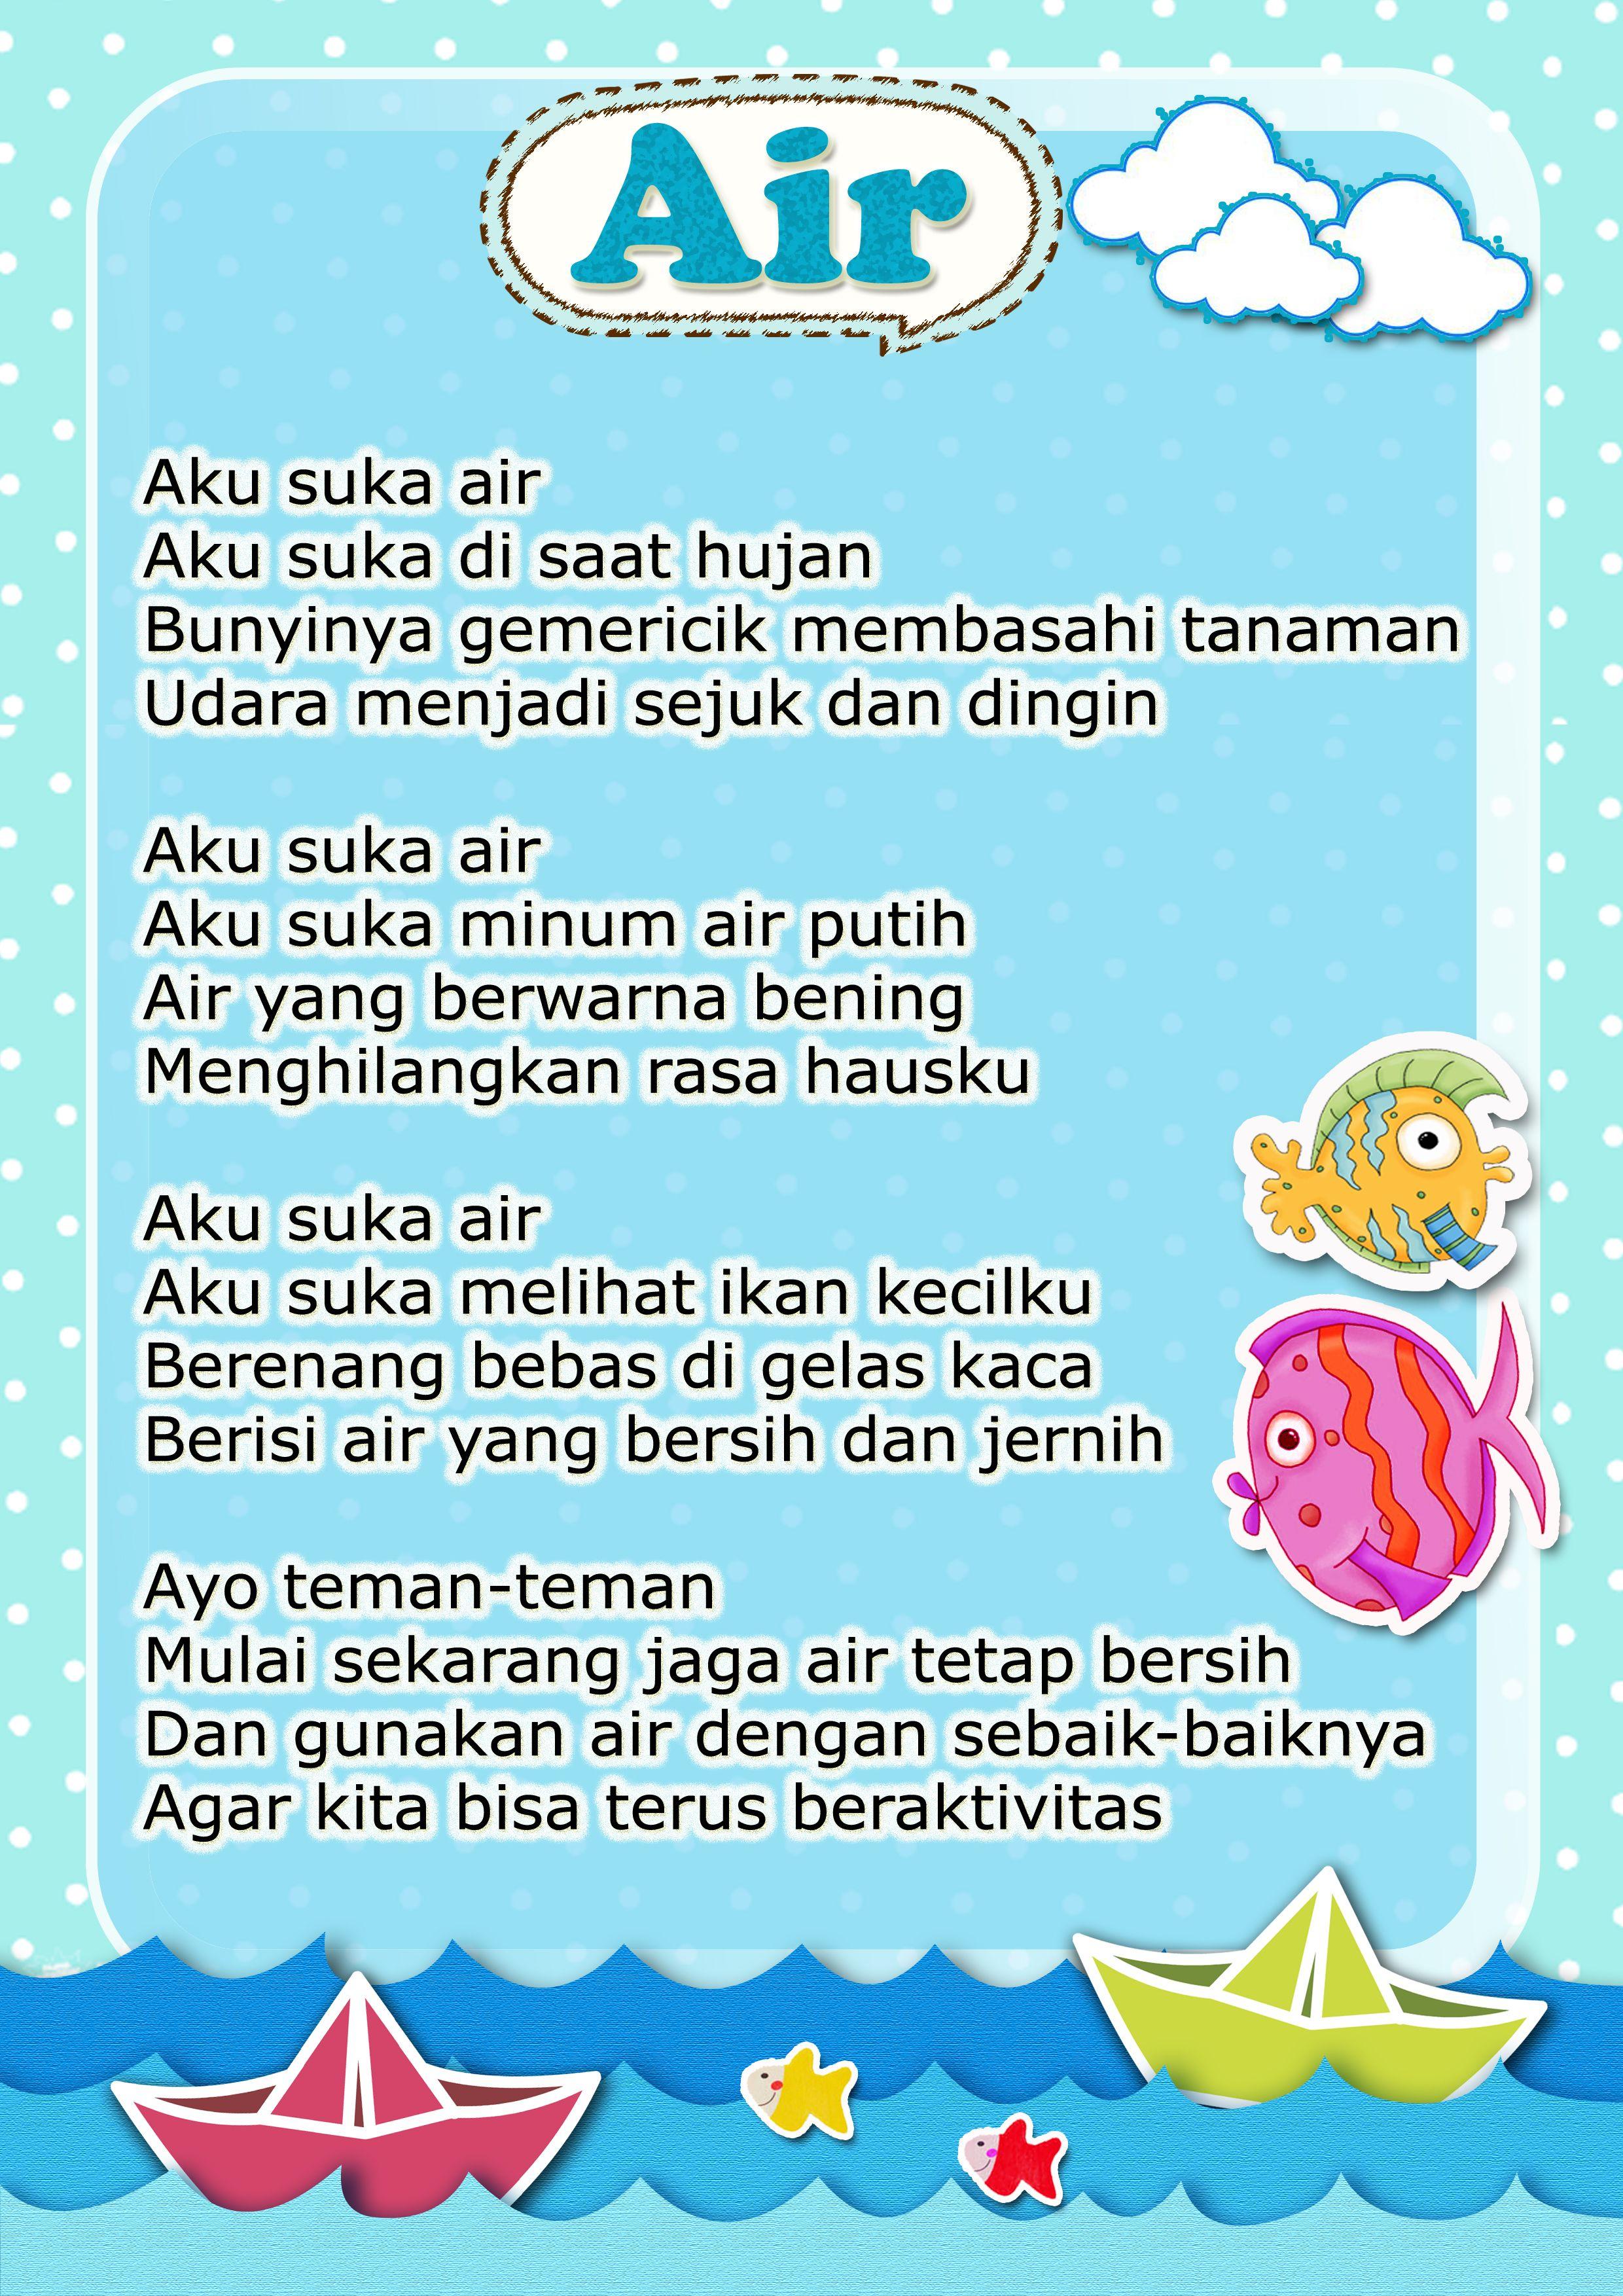 Belajar Membaca Cerita Untuk Anak Tk Siti